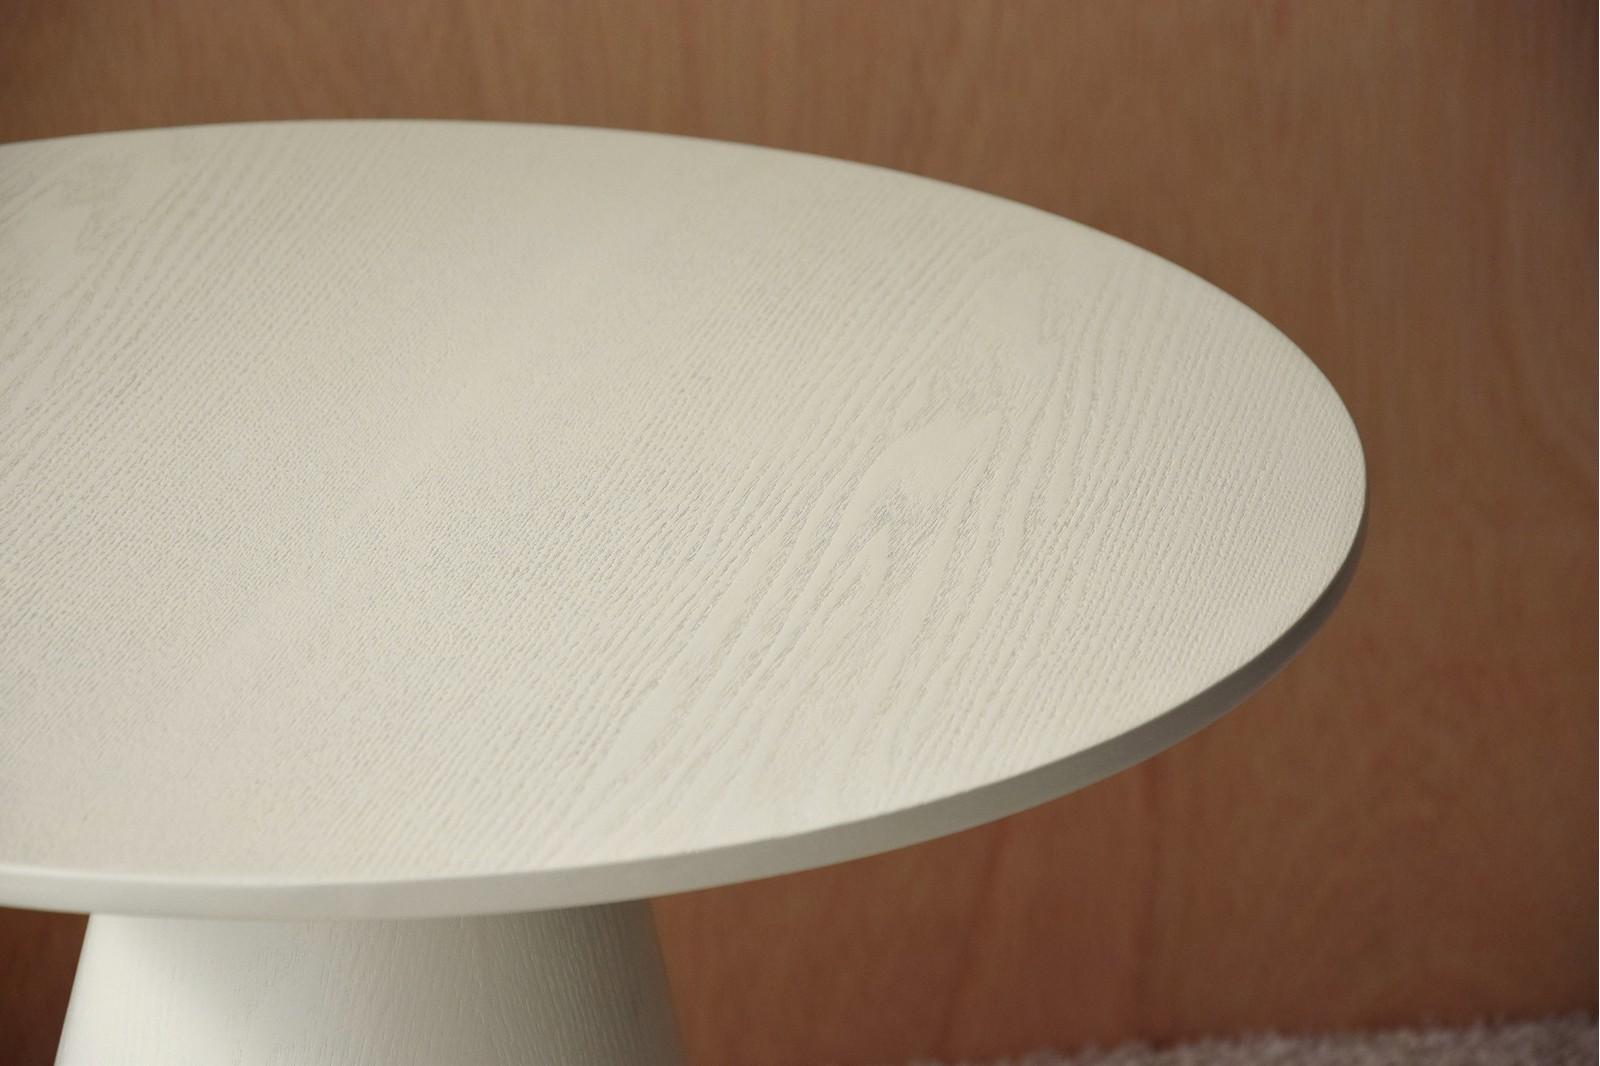 ROUND SIDE TABLE. MATT WARM WHITE ASH VENEER